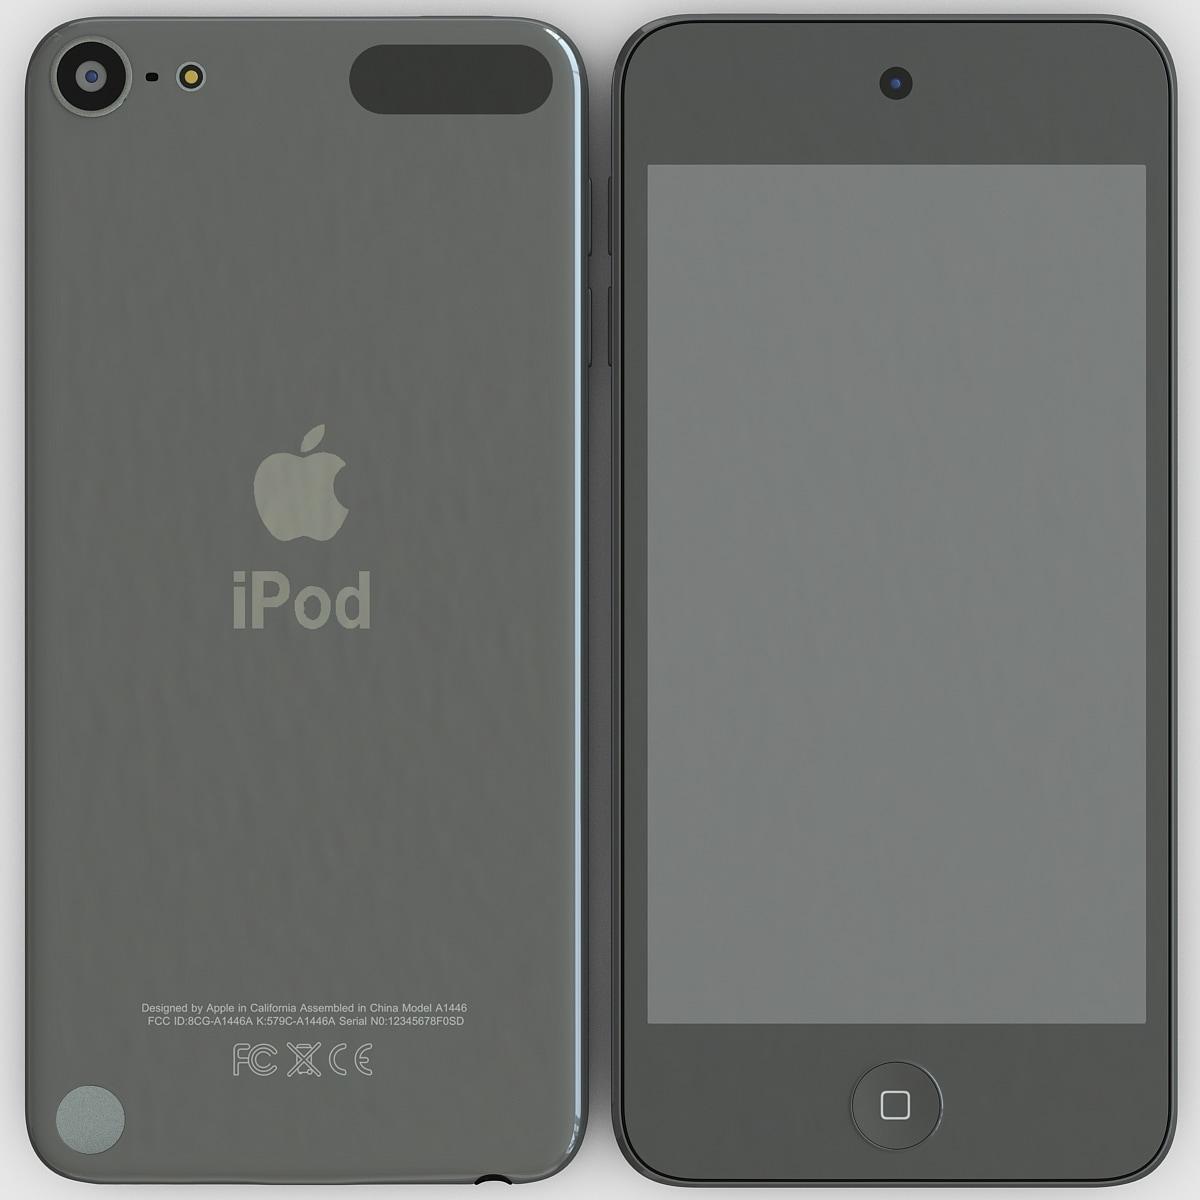 Ipod_Nano_Generation_5th_Black_005.jpg